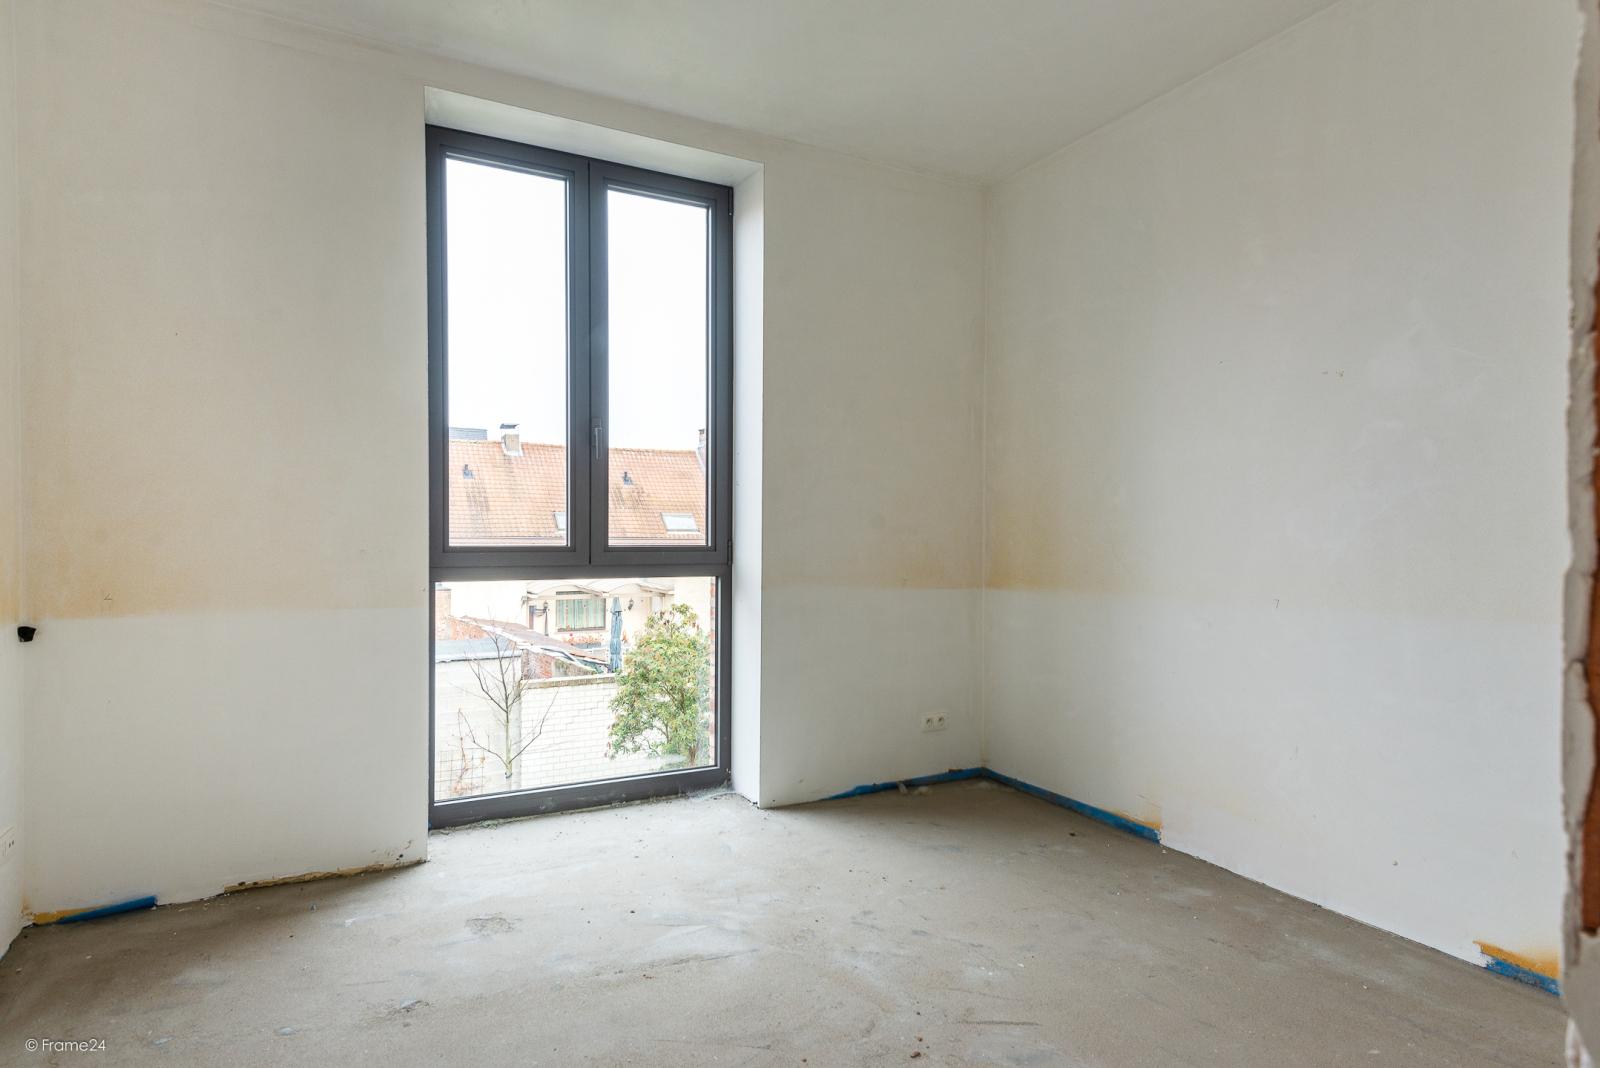 Riant vernieuwd appartement (147 m²) op centrale ligging te Walem! afbeelding 5